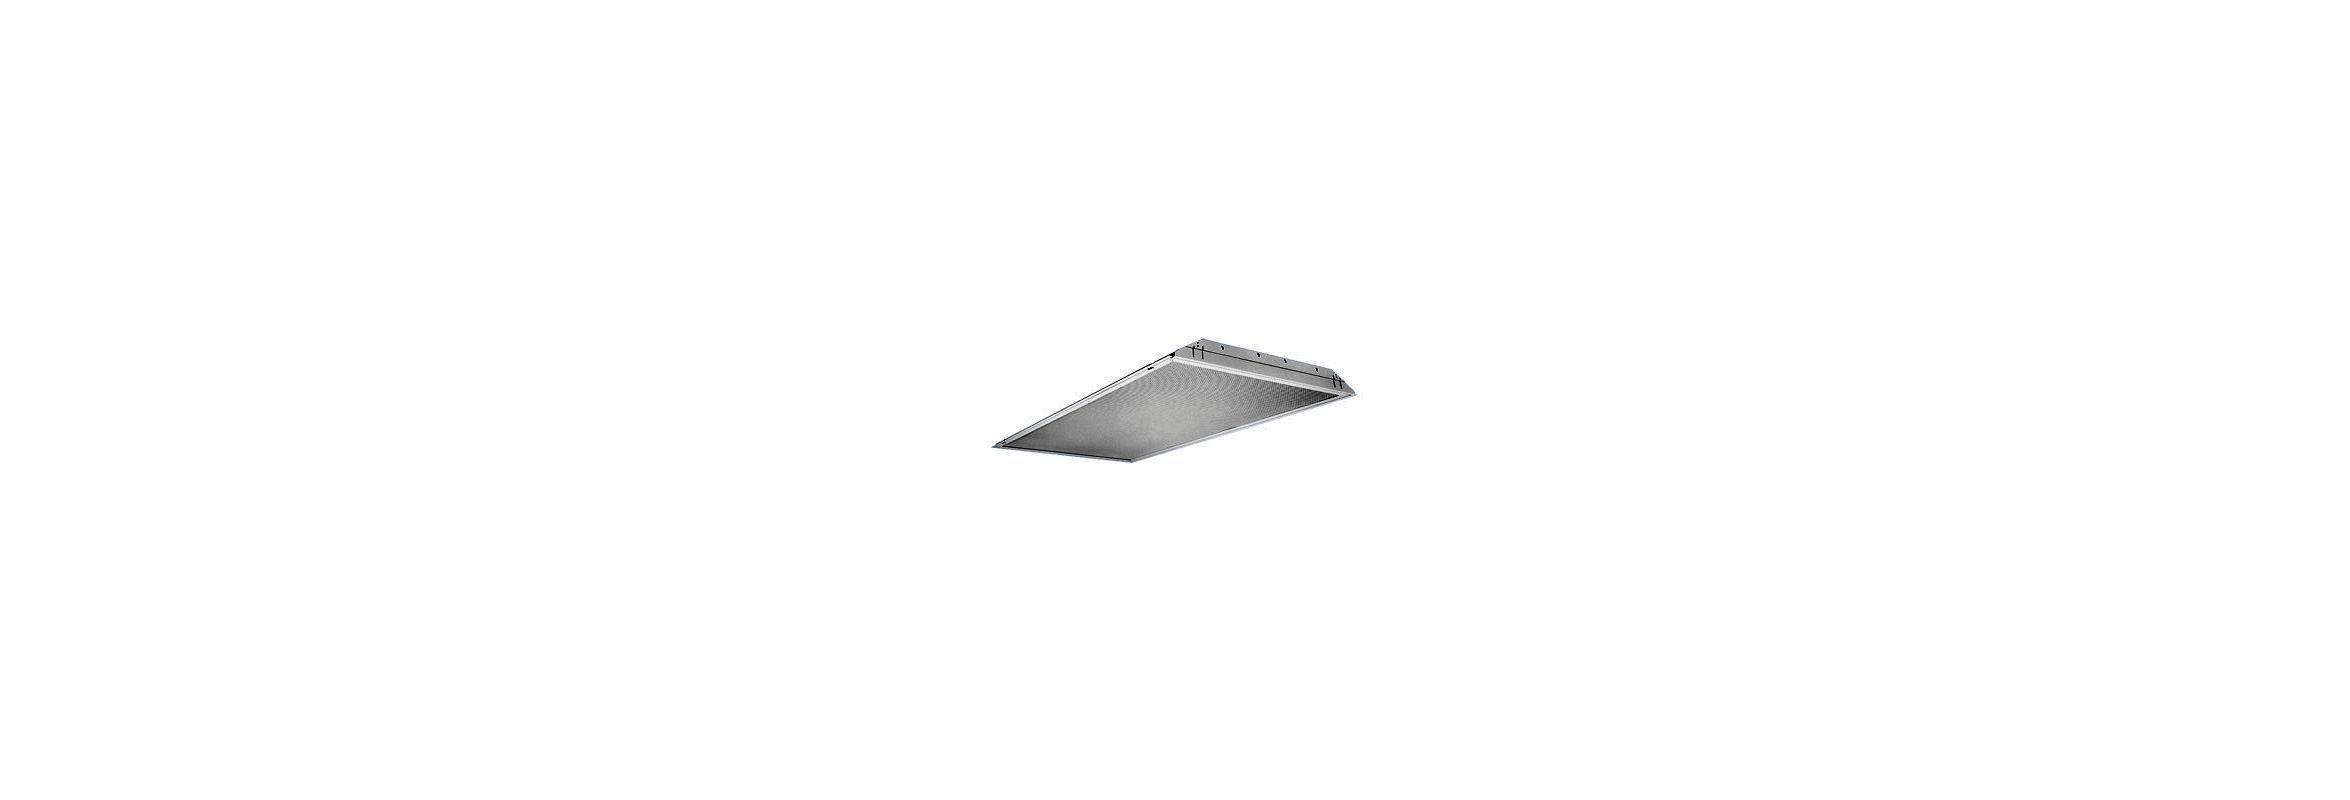 Lithonia Lighting 2gt8 2 32 A12 Mvolt